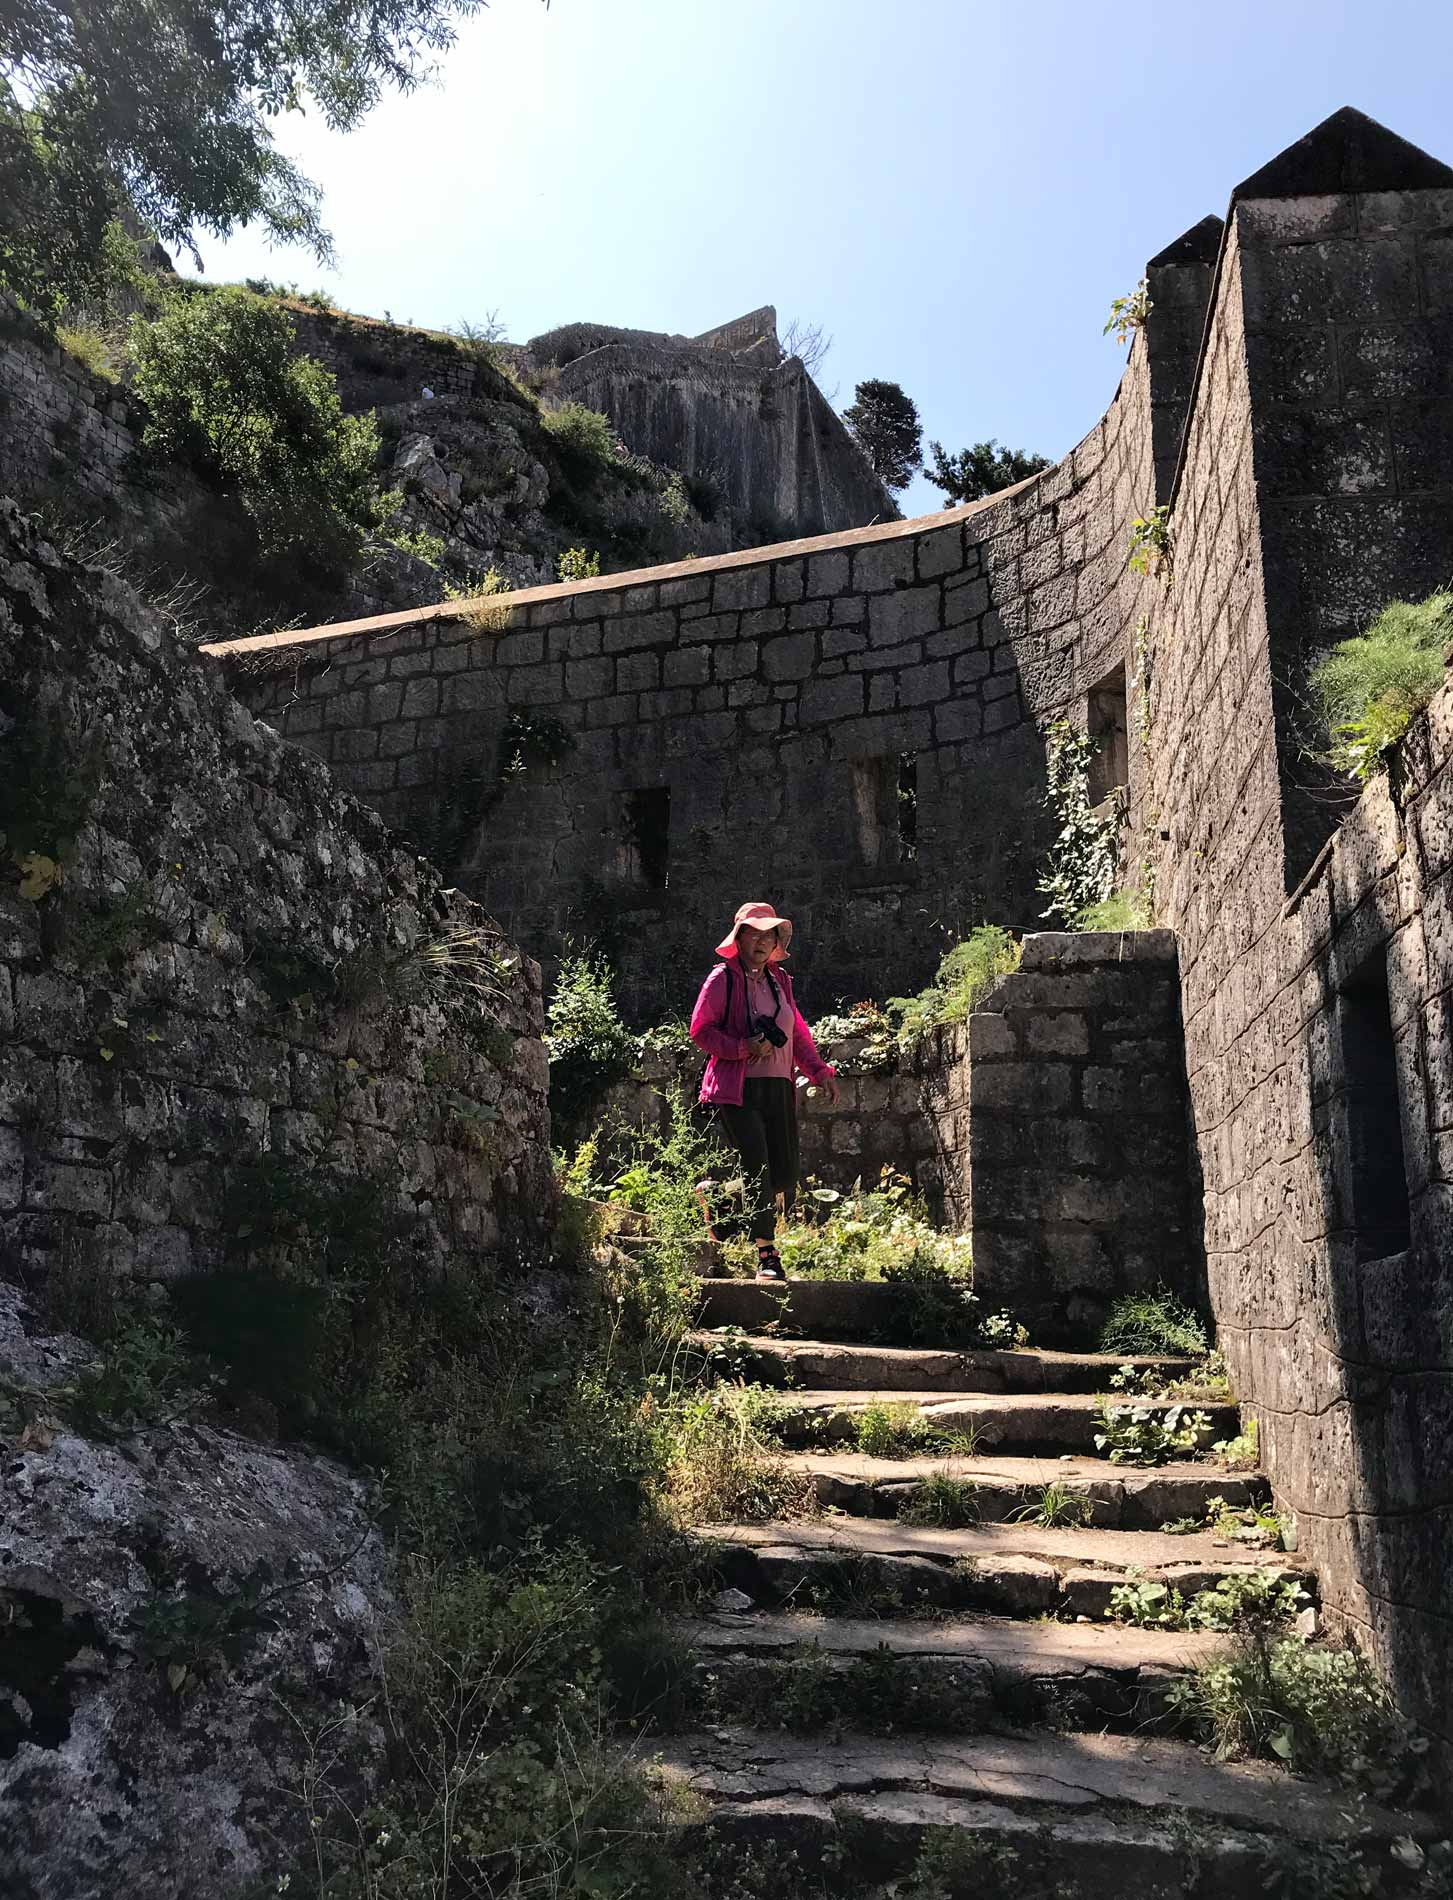 Kotor-Montenegro-mura-fortificazioni-veneziane-turista-giapponese